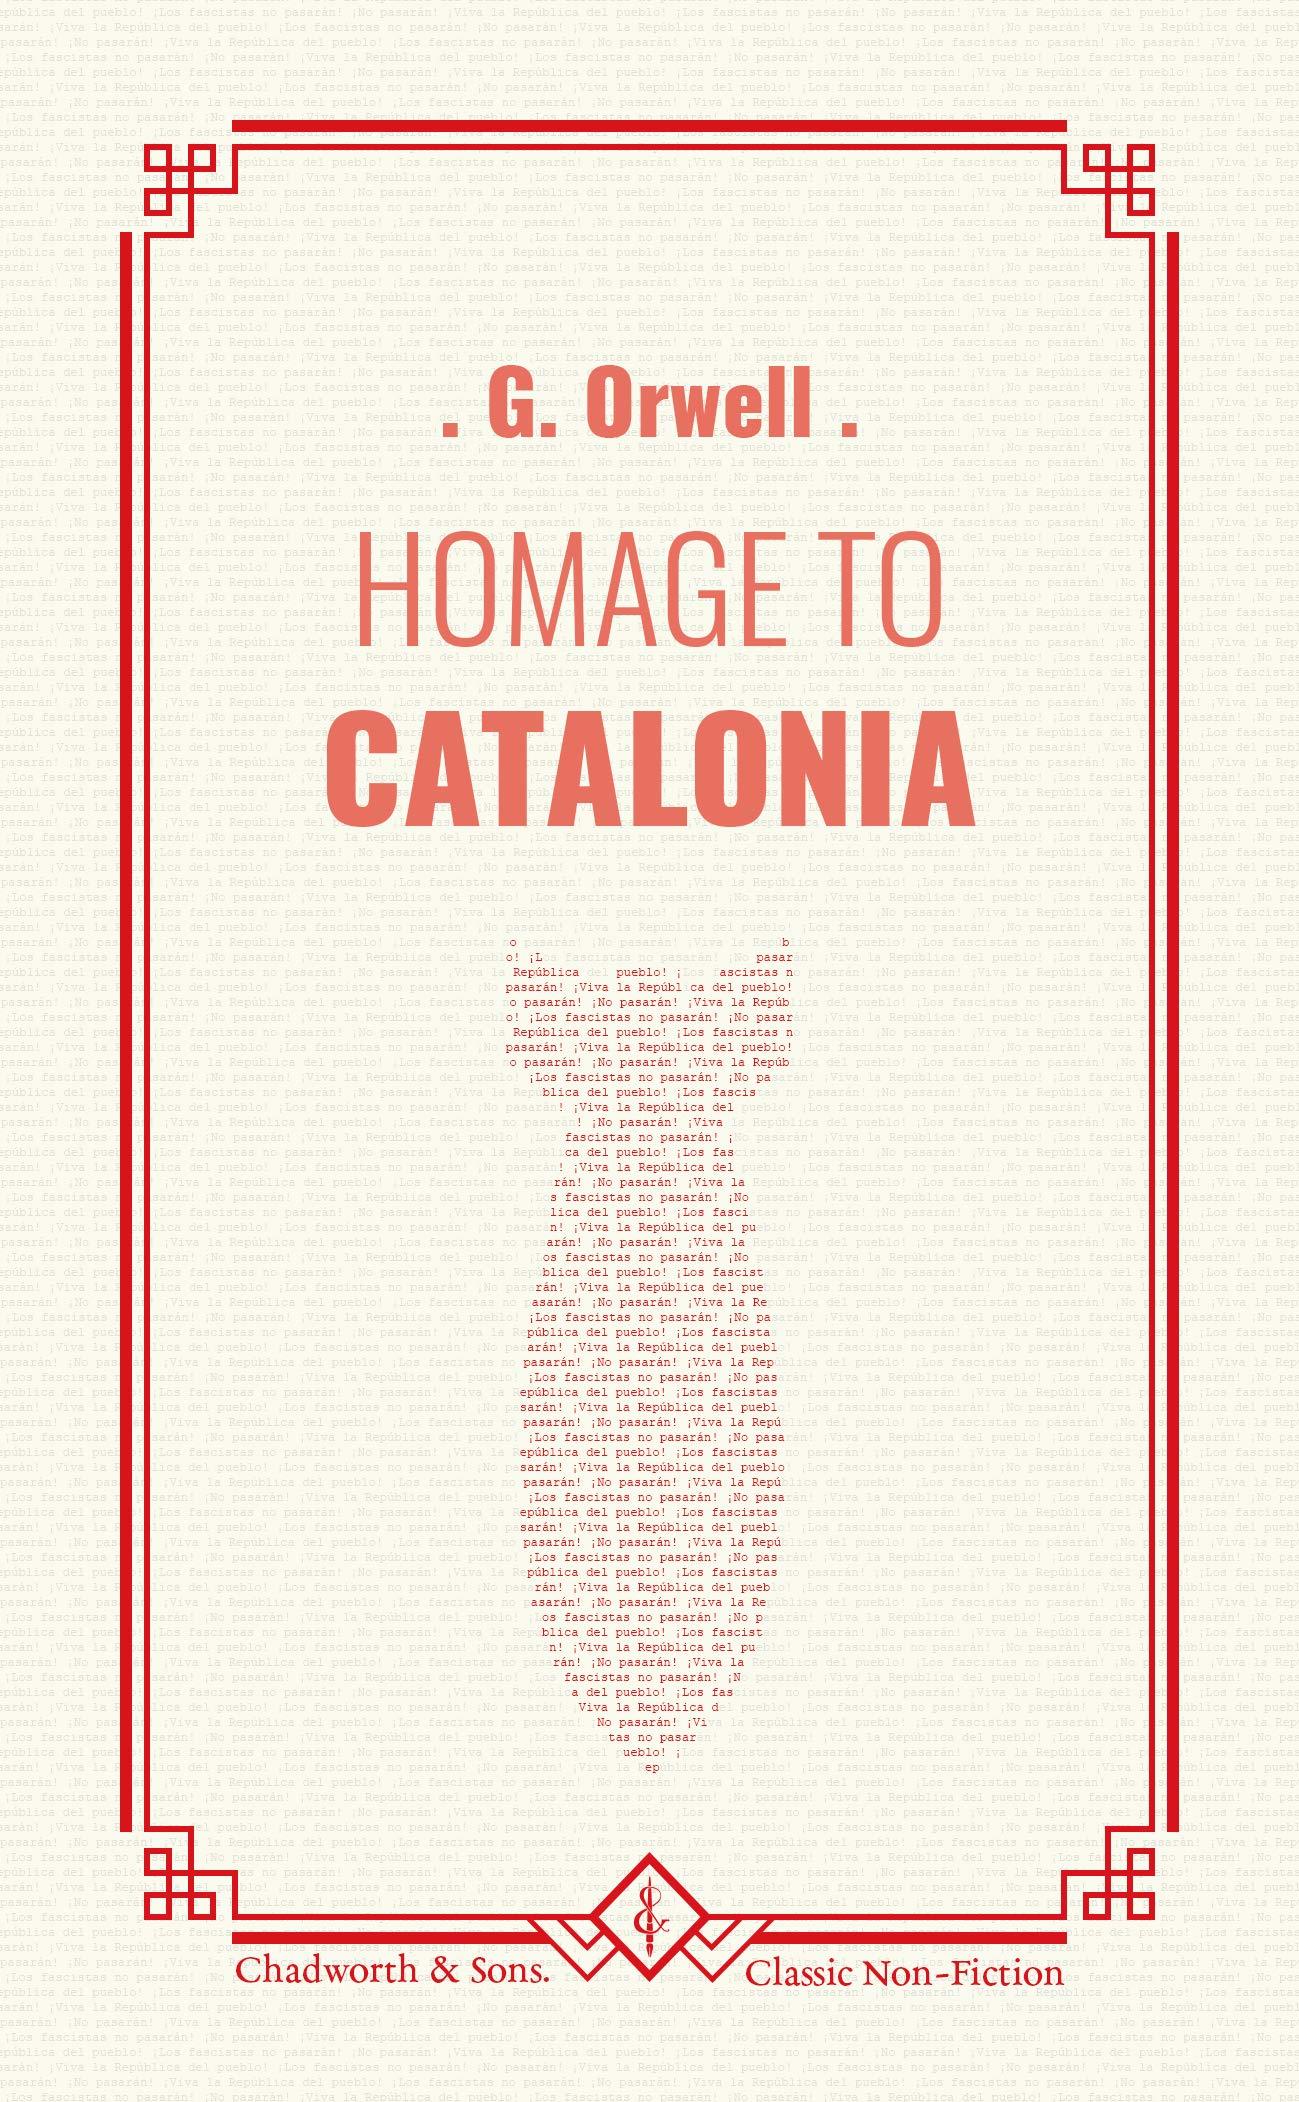 Homage to Catalonia: